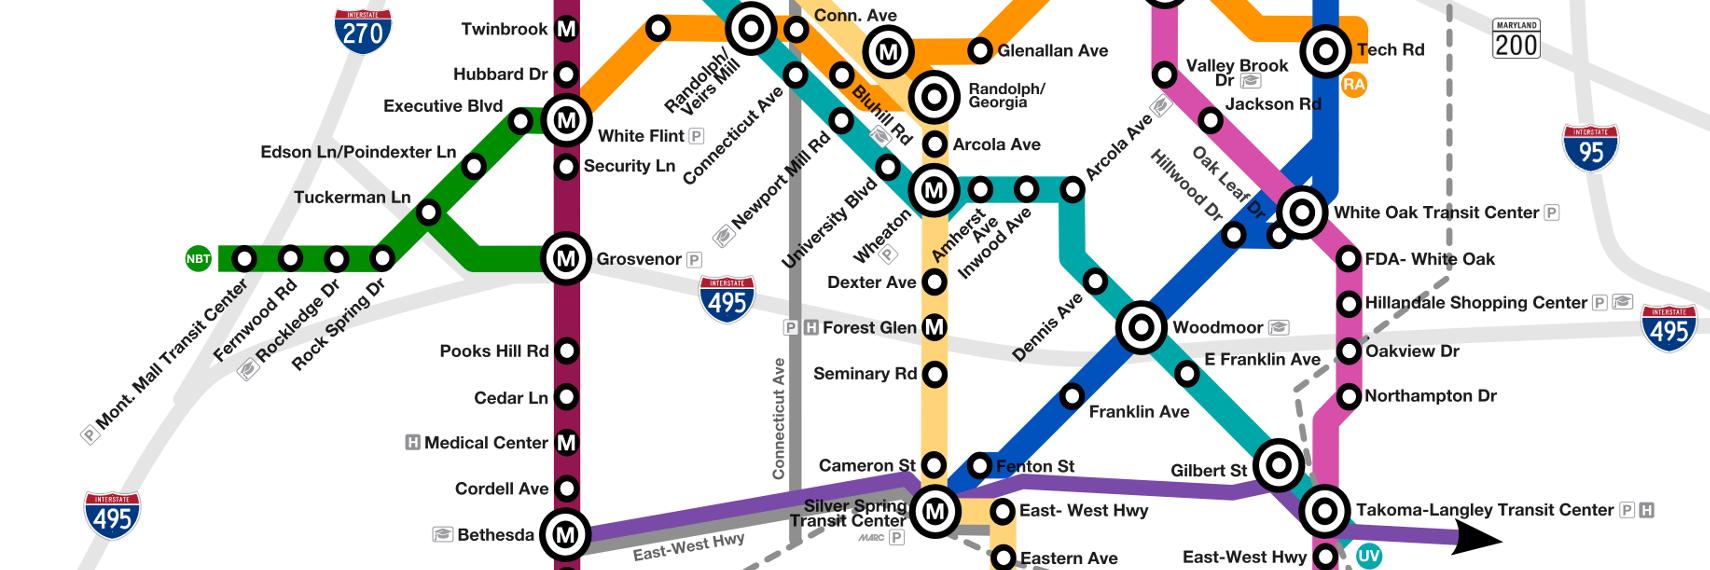 MetroMapHead.png